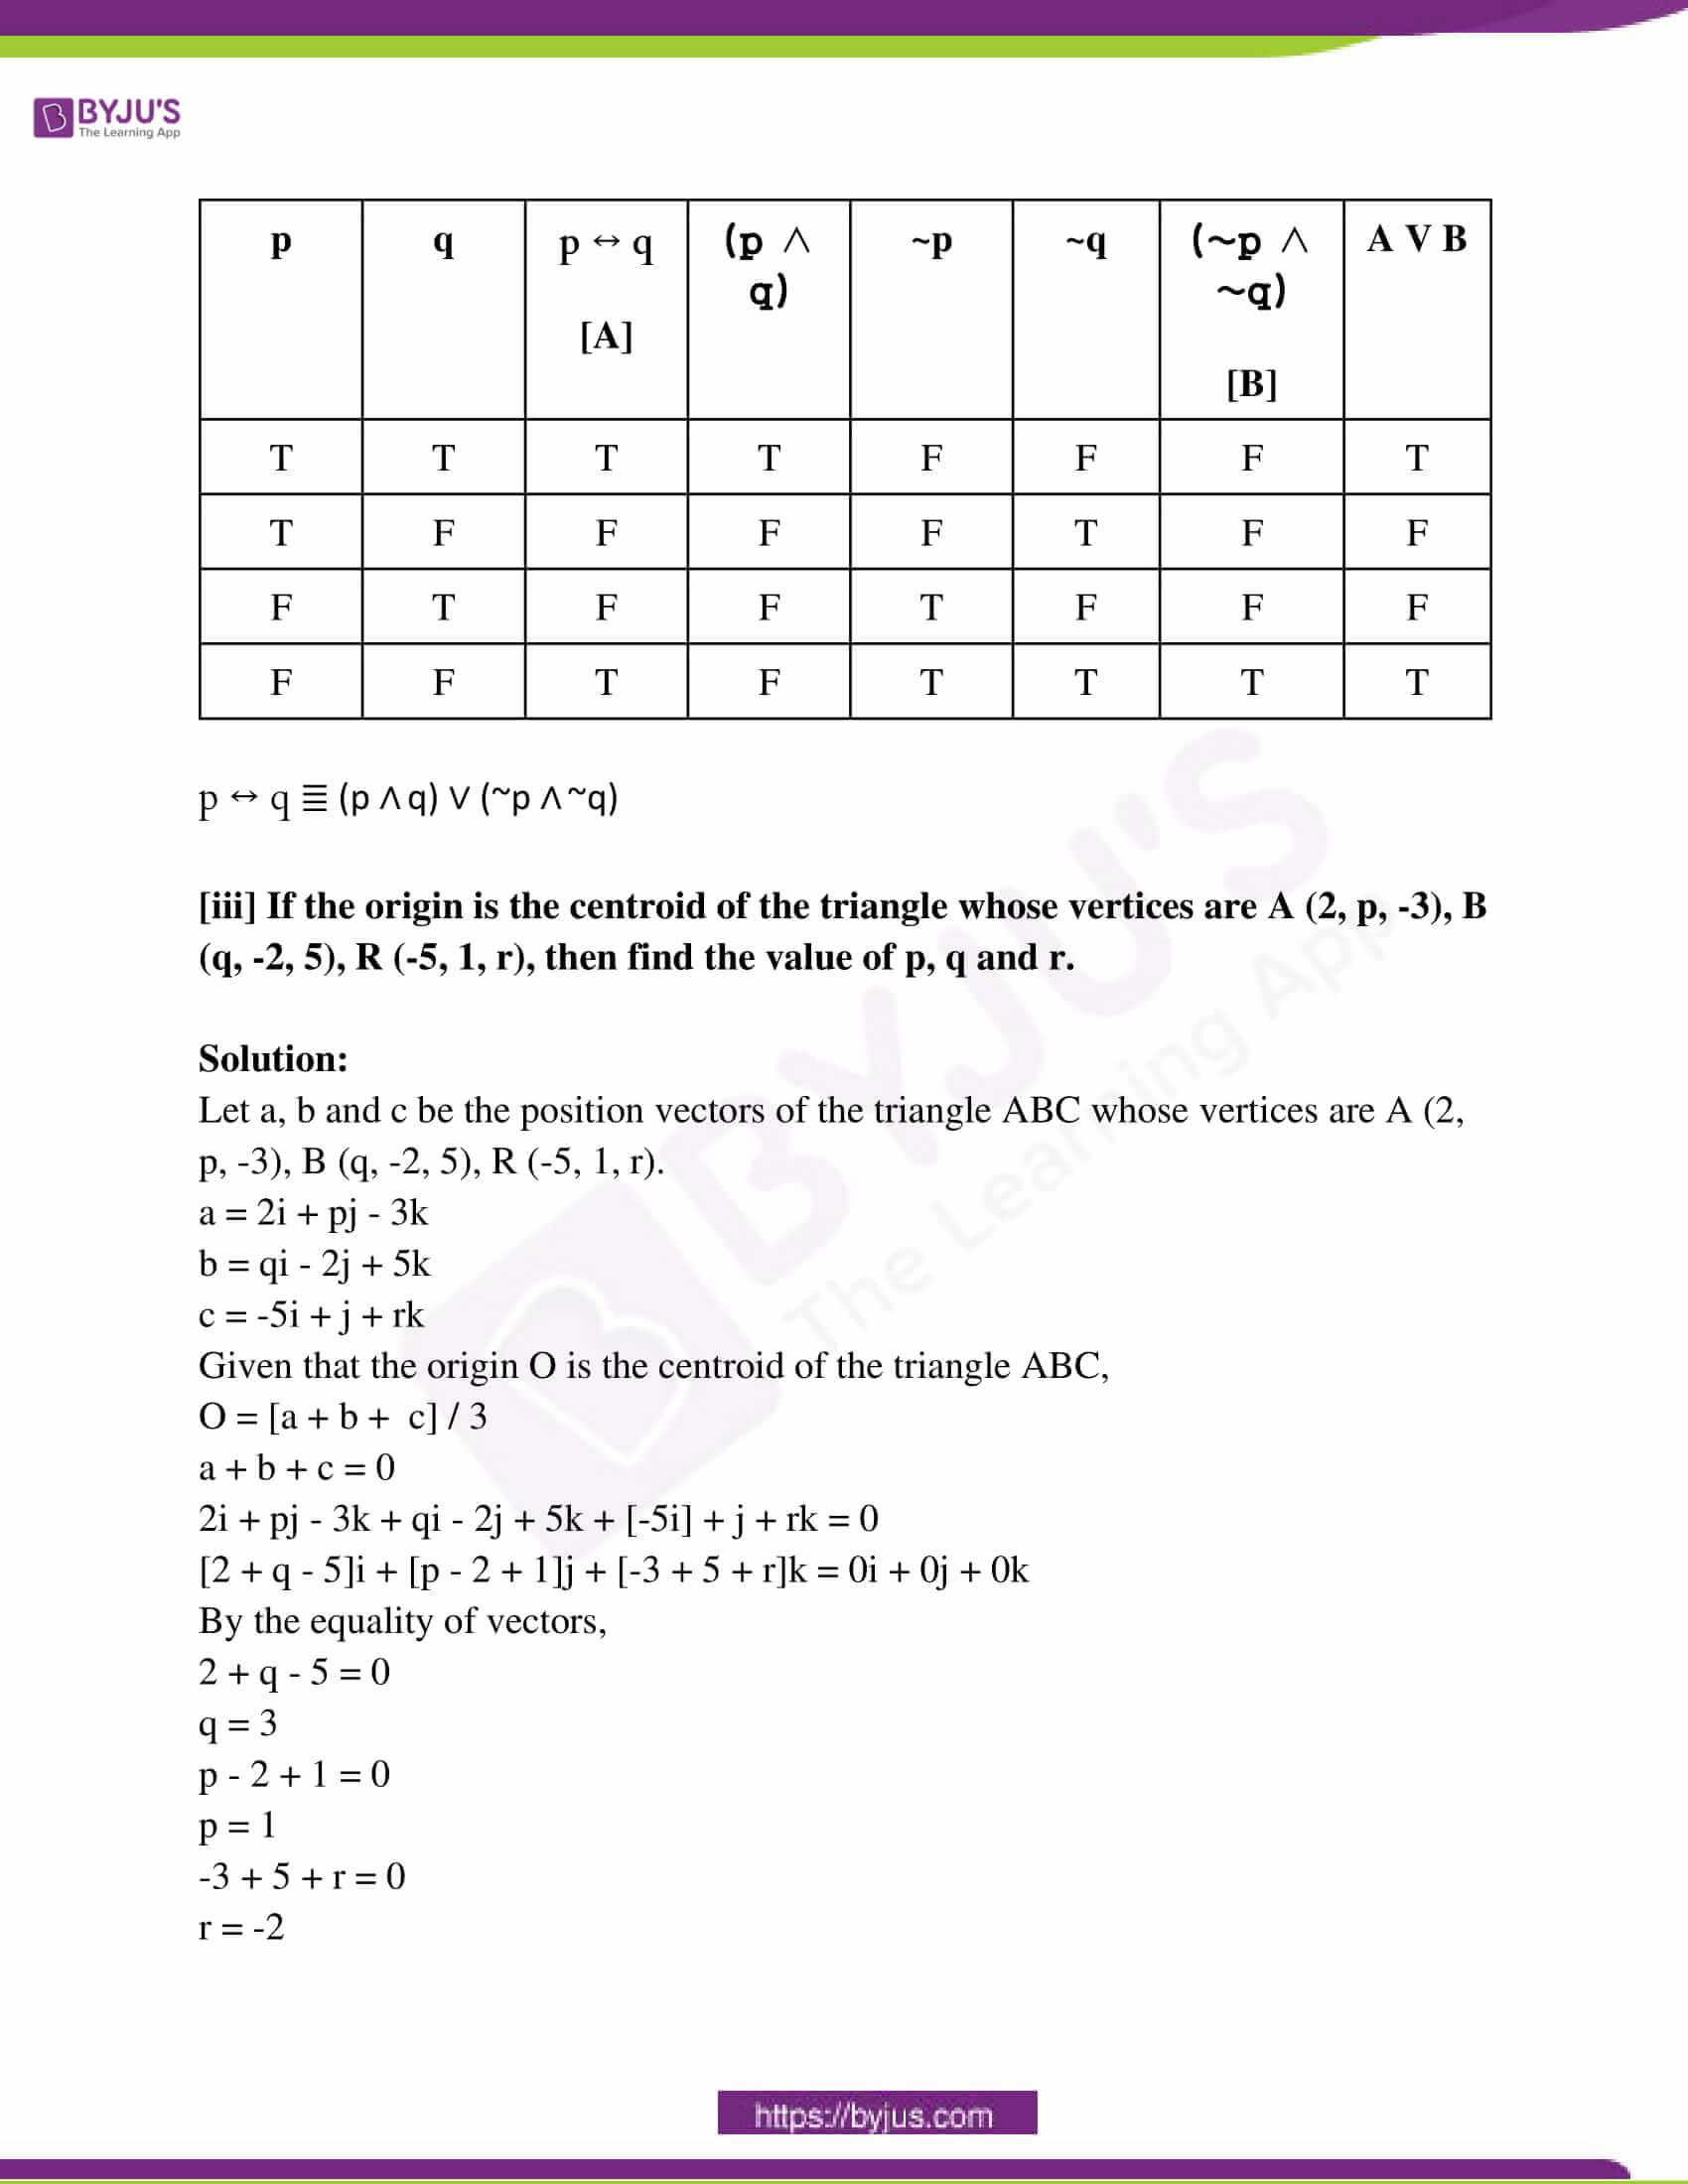 maharashtra class 12 exam question paper solutions march 2018 06